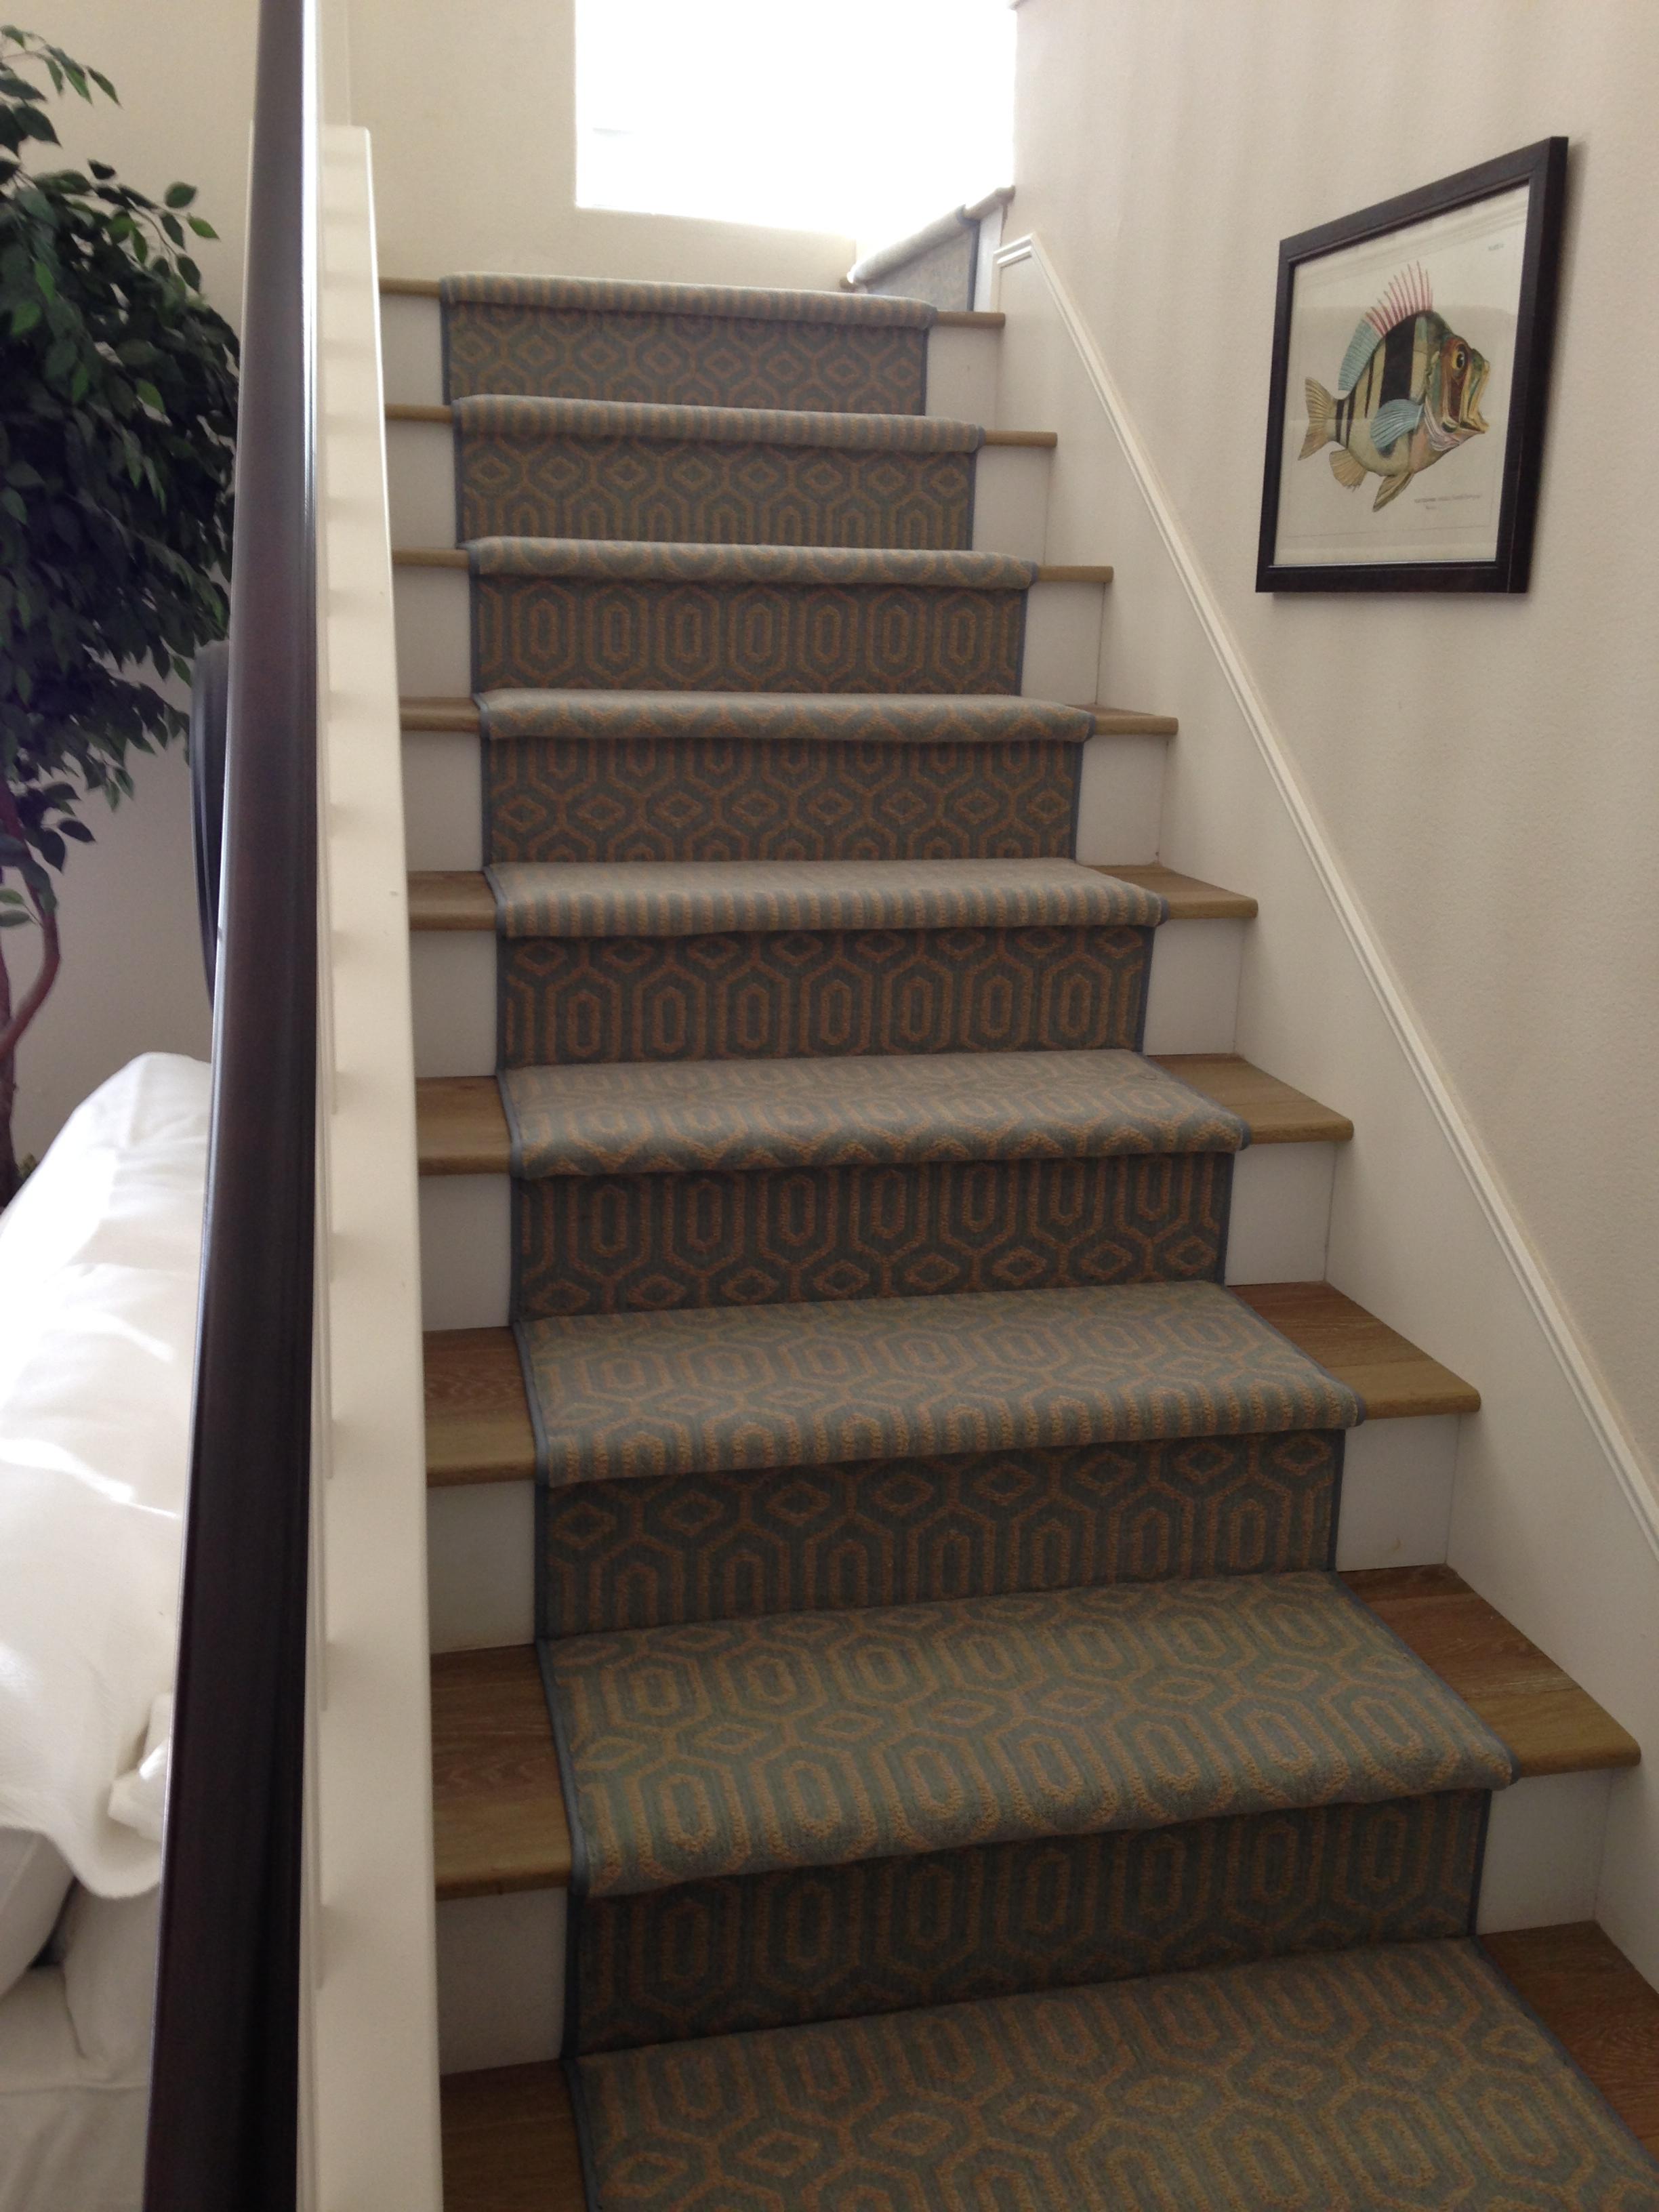 Stanton Atelier Miro Ocean Stair Runner Hemphill S Rugs